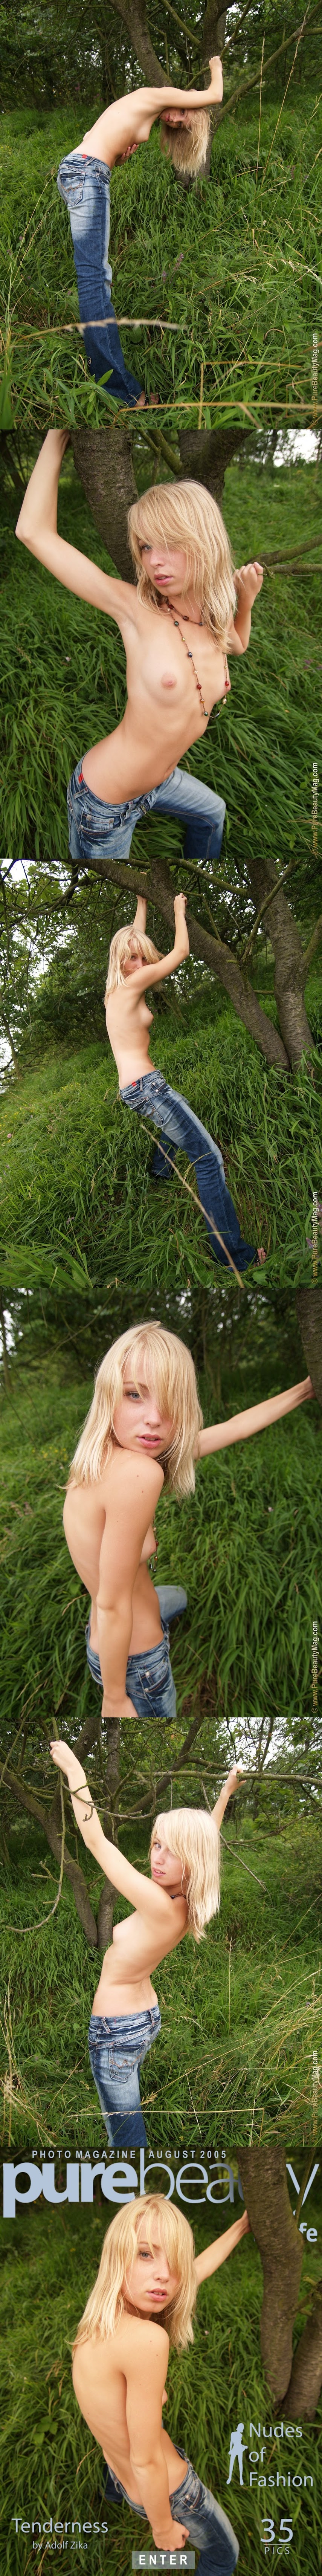 PureBeautyMag PBM  - 2005-08-24 -  s105563 - Veronika Drbohlavova - Tenderness - 2560px